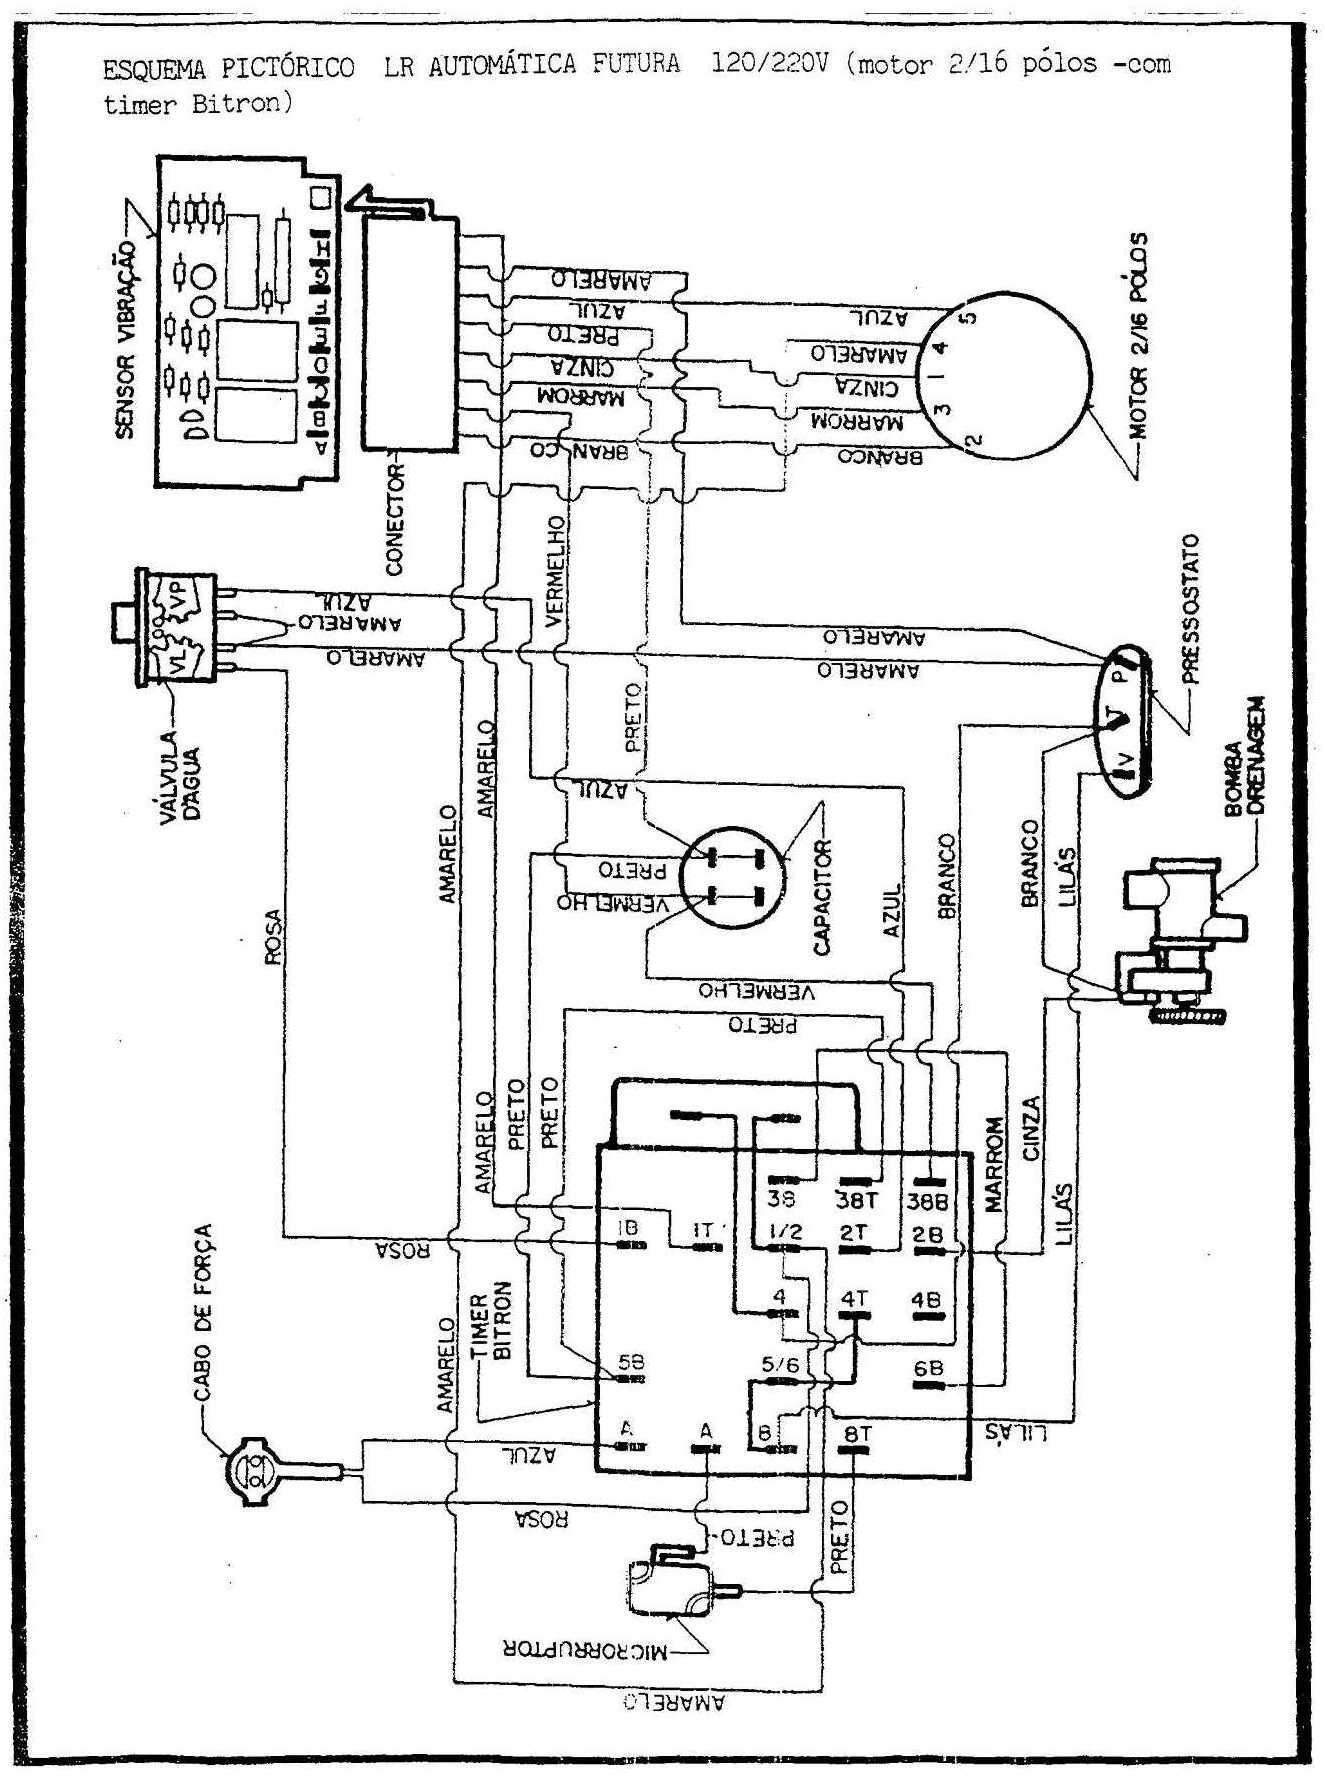 Circuito Electrico Marshall